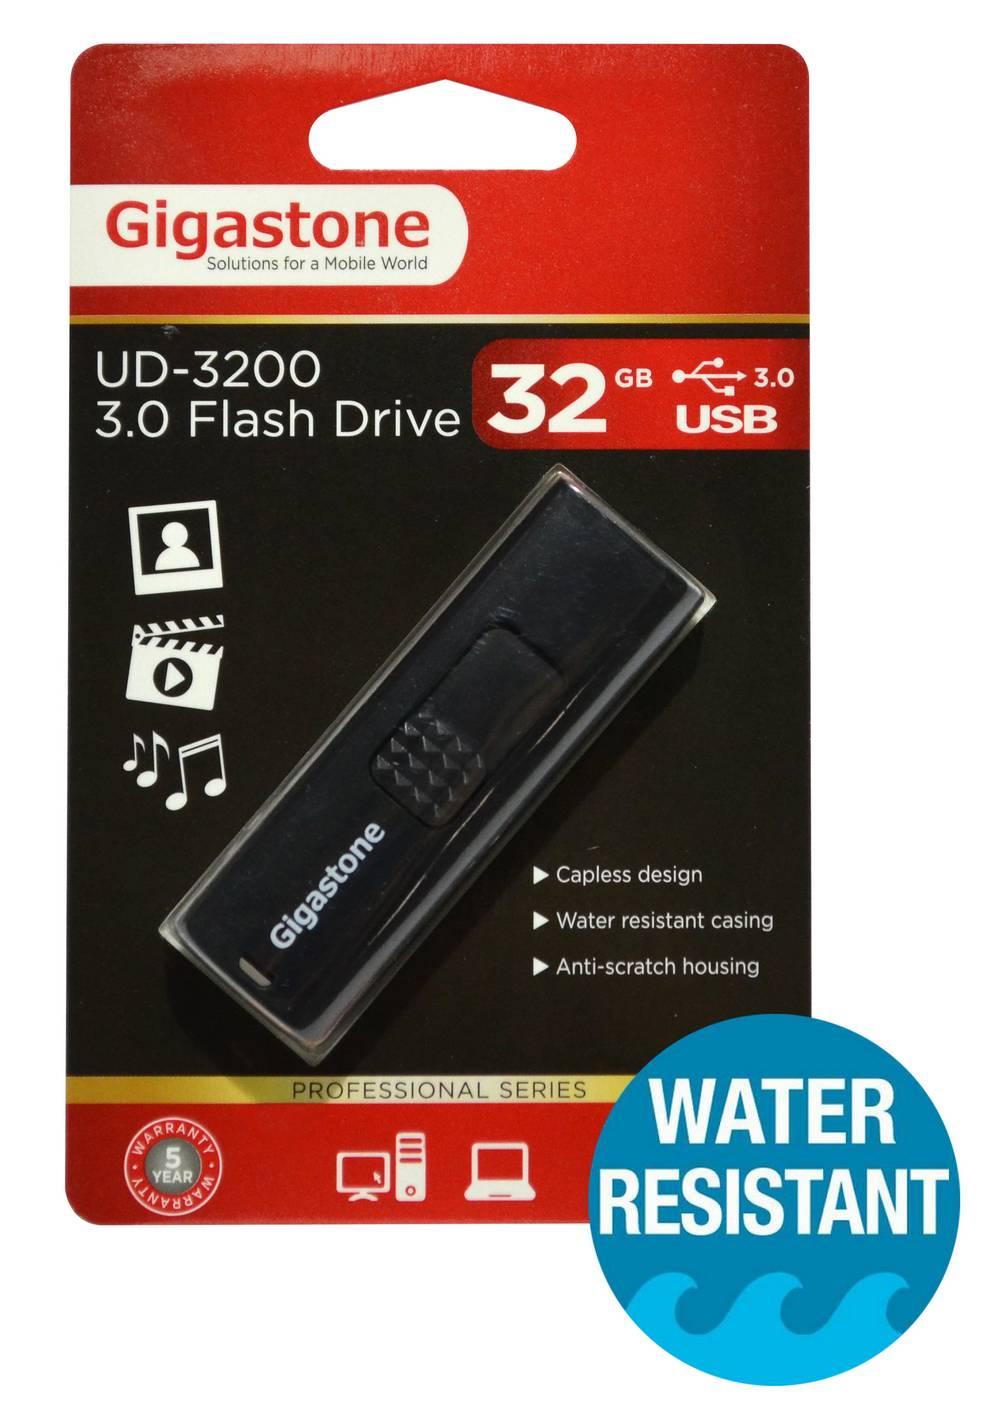 USB 3.0 Gigastone Flash Drive UD-3200 32GB Μαύρο Professional Series